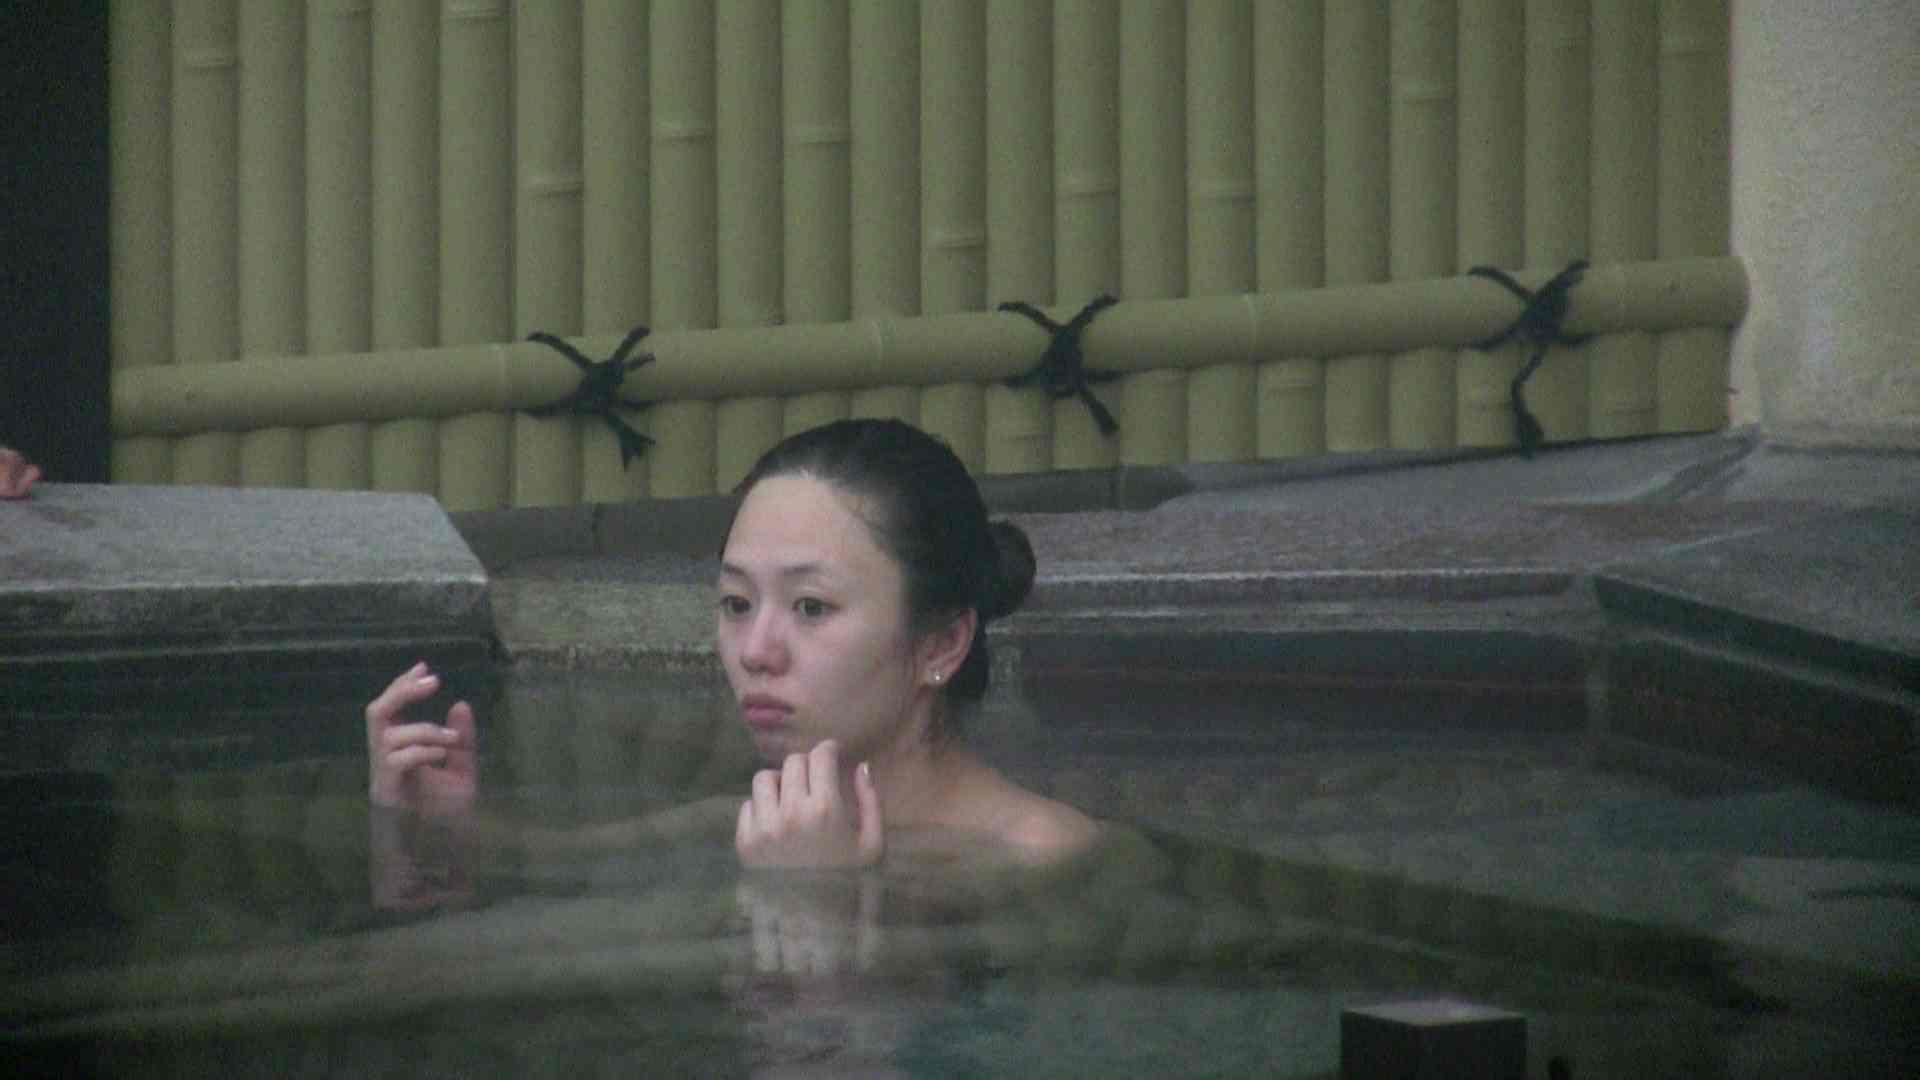 Aquaな露天風呂Vol.586 露天   HなOL  58pic 1